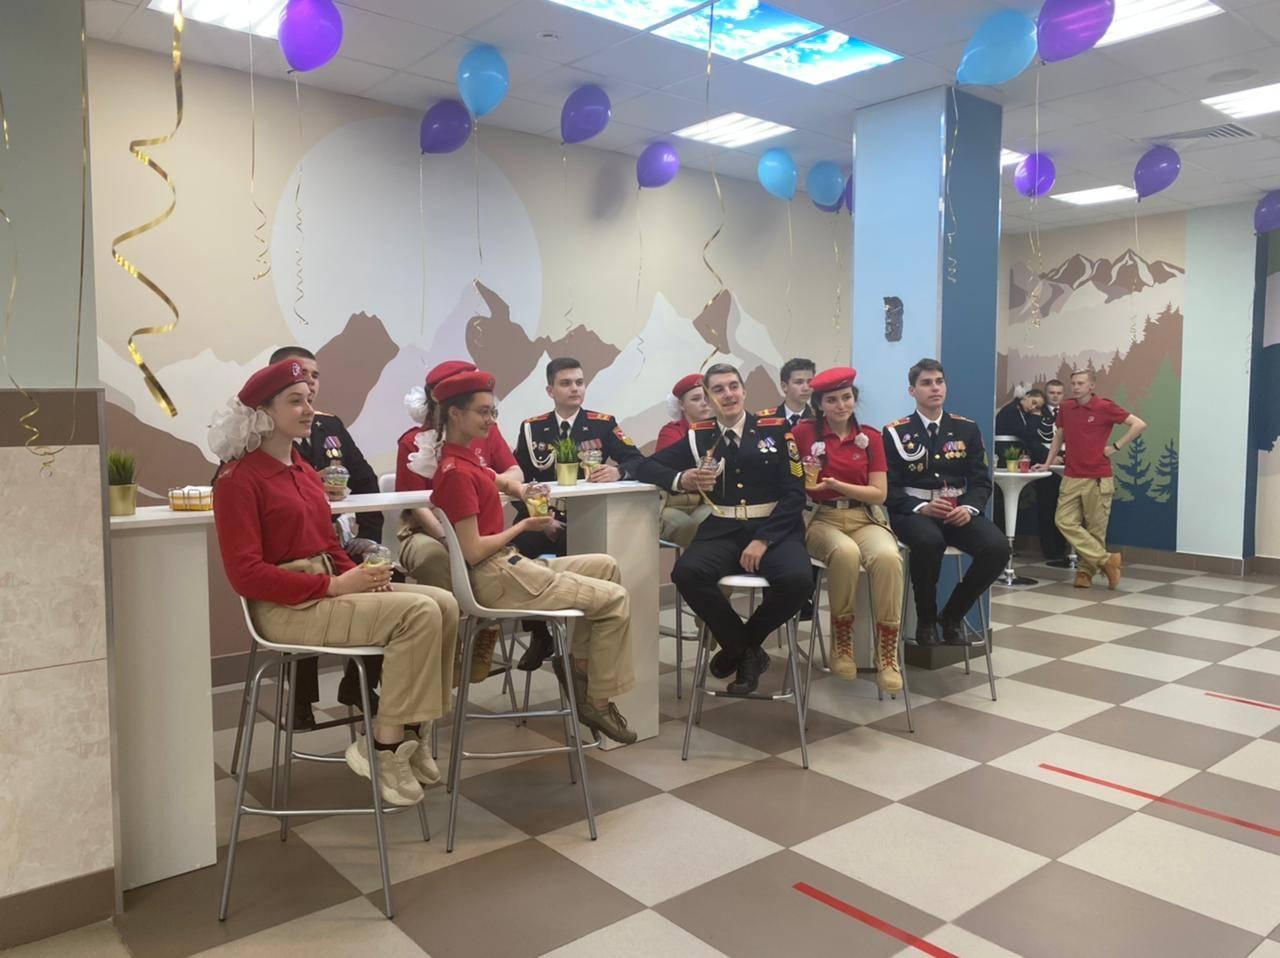 Кадеты и юнармейцы ГБОУ Школы №709 г. Москвы в зоне отдыха кафе-бар